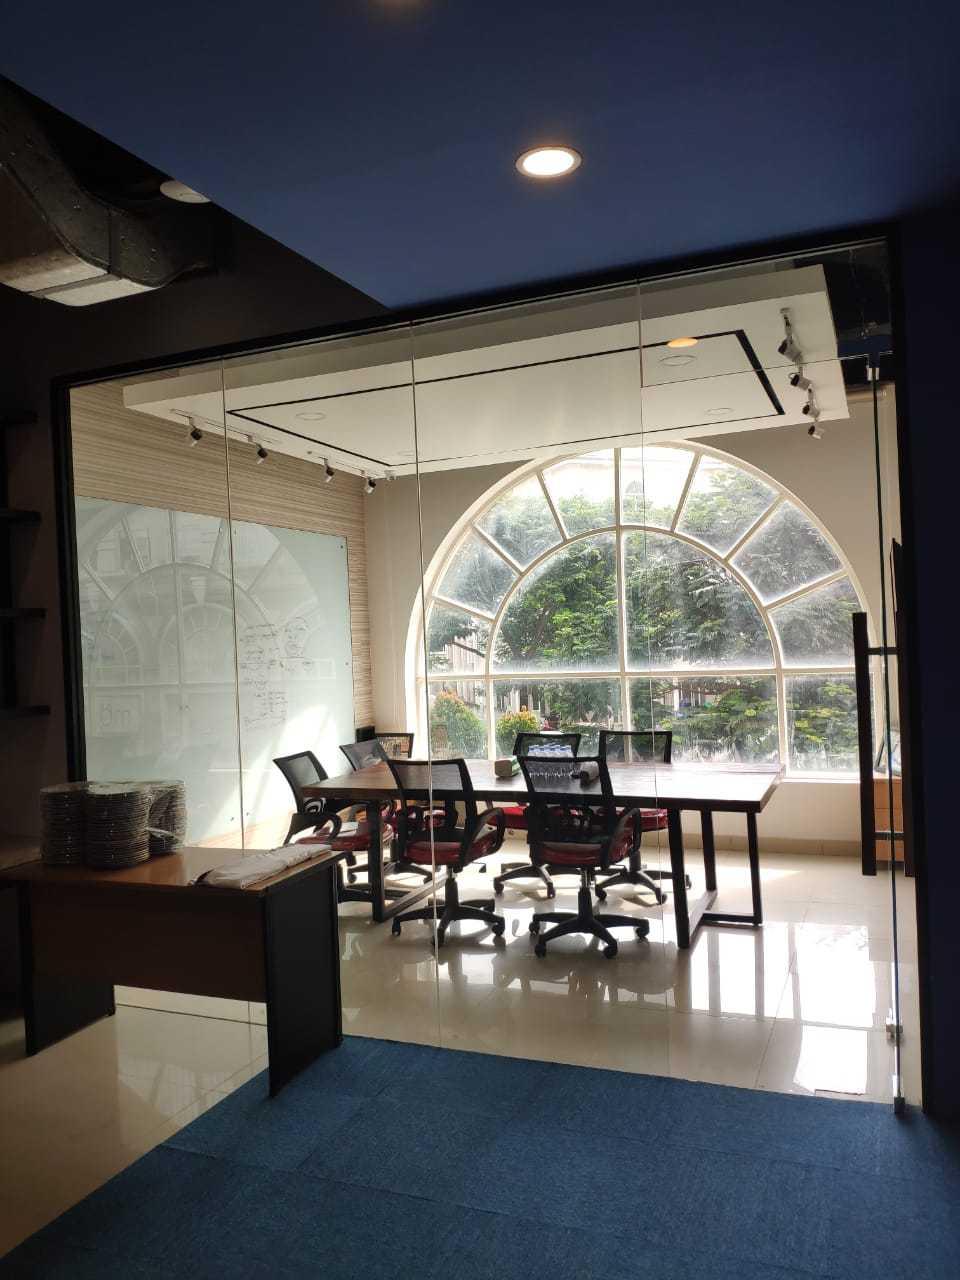 Desco Architect Daikin Proshop Showroom Kenzo Jakarta, Daerah Khusus Ibukota Jakarta, Indonesia Jakarta, Daerah Khusus Ibukota Jakarta, Indonesia Desco-Architect-Daikin-Proshop-Showroom-Kenzo  69643